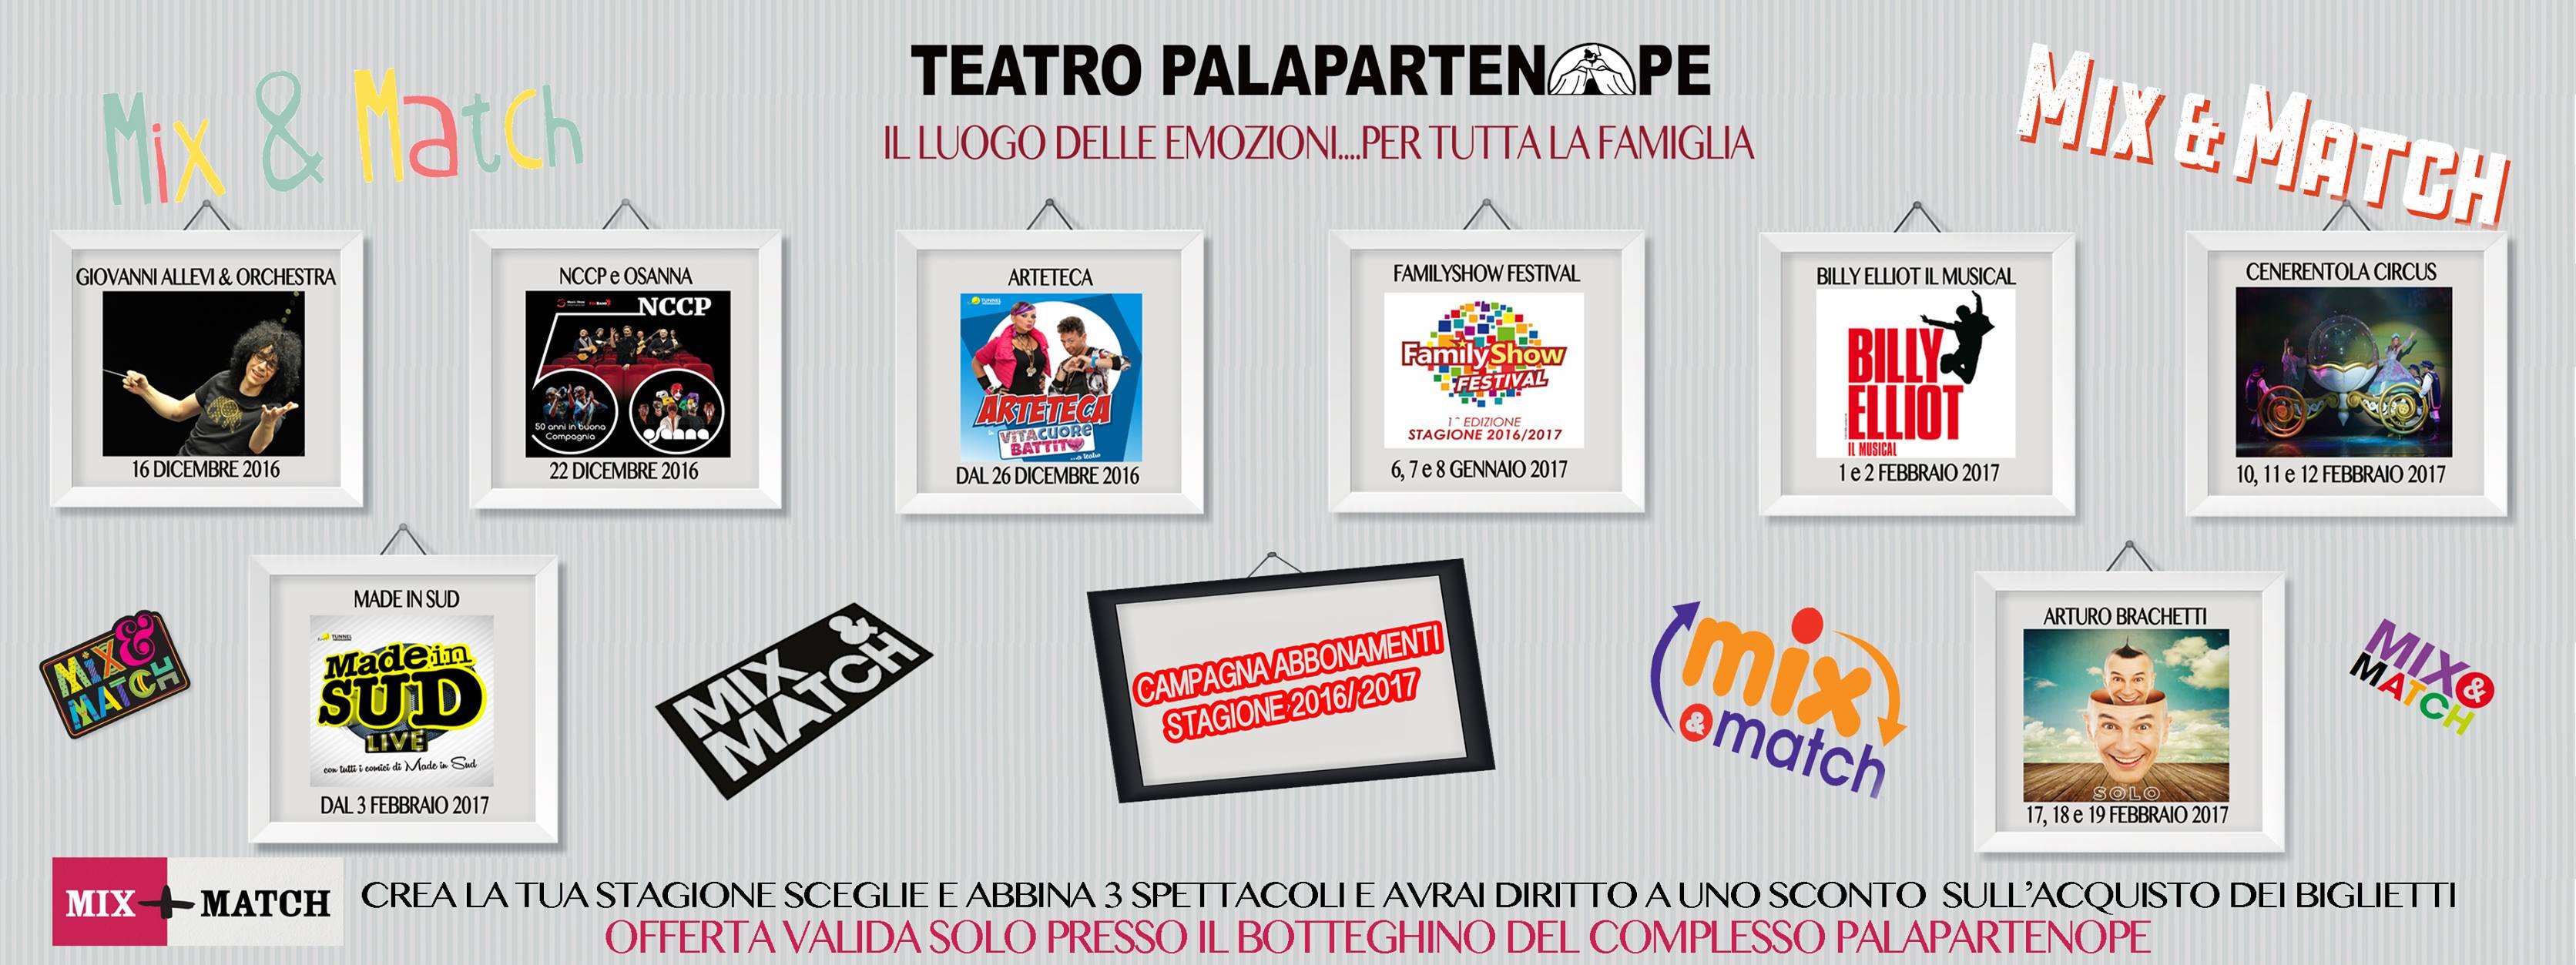 Teatro Palapartenope Stagione 2016-17